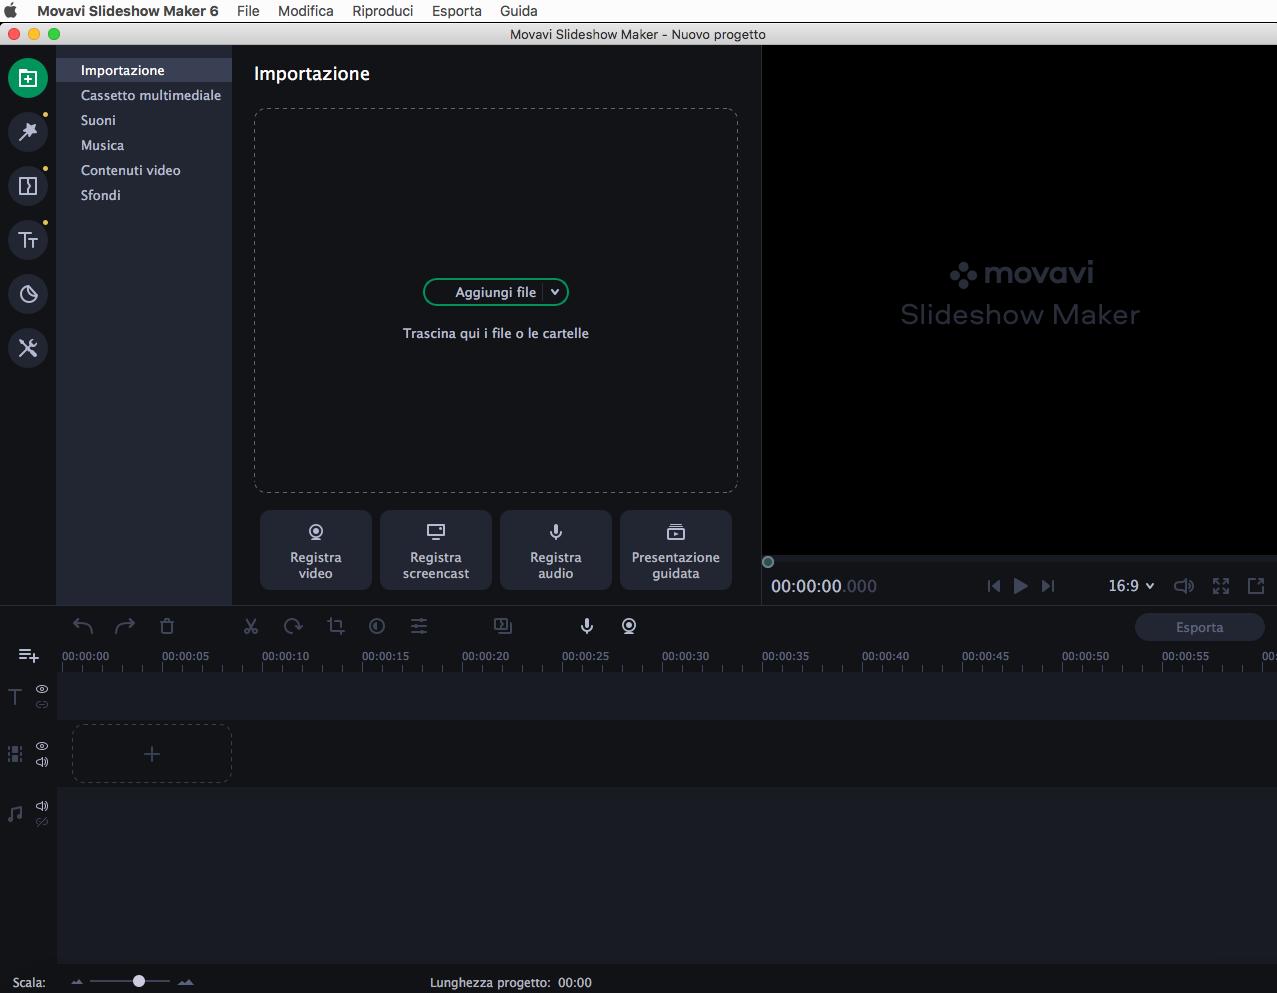 [MAC] Movavi Slideshow Maker 6.4.0 macOS - ITA